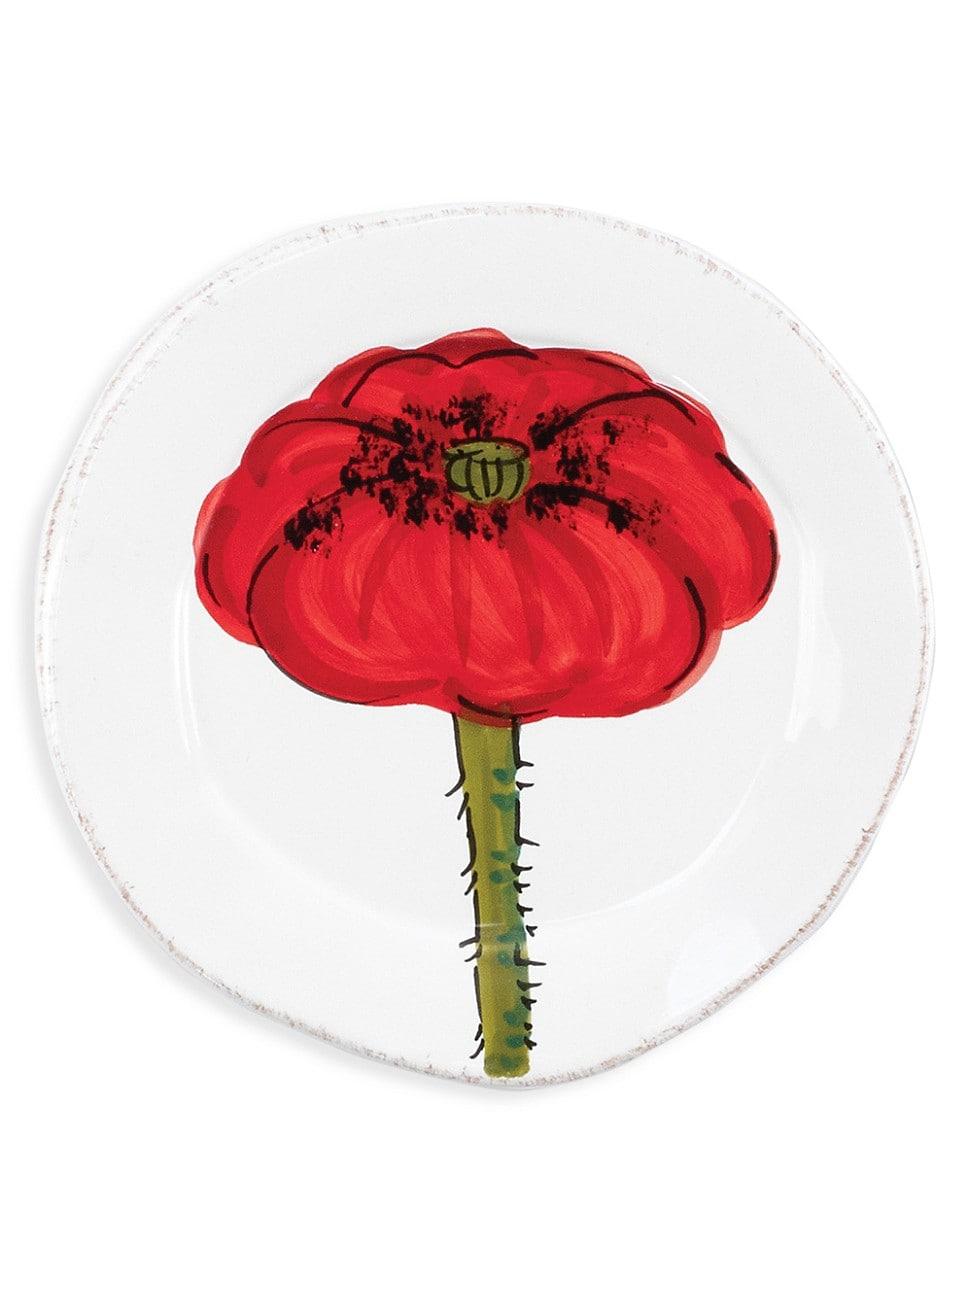 Vietri Lastra Poppy Canape Plate In Handpainted